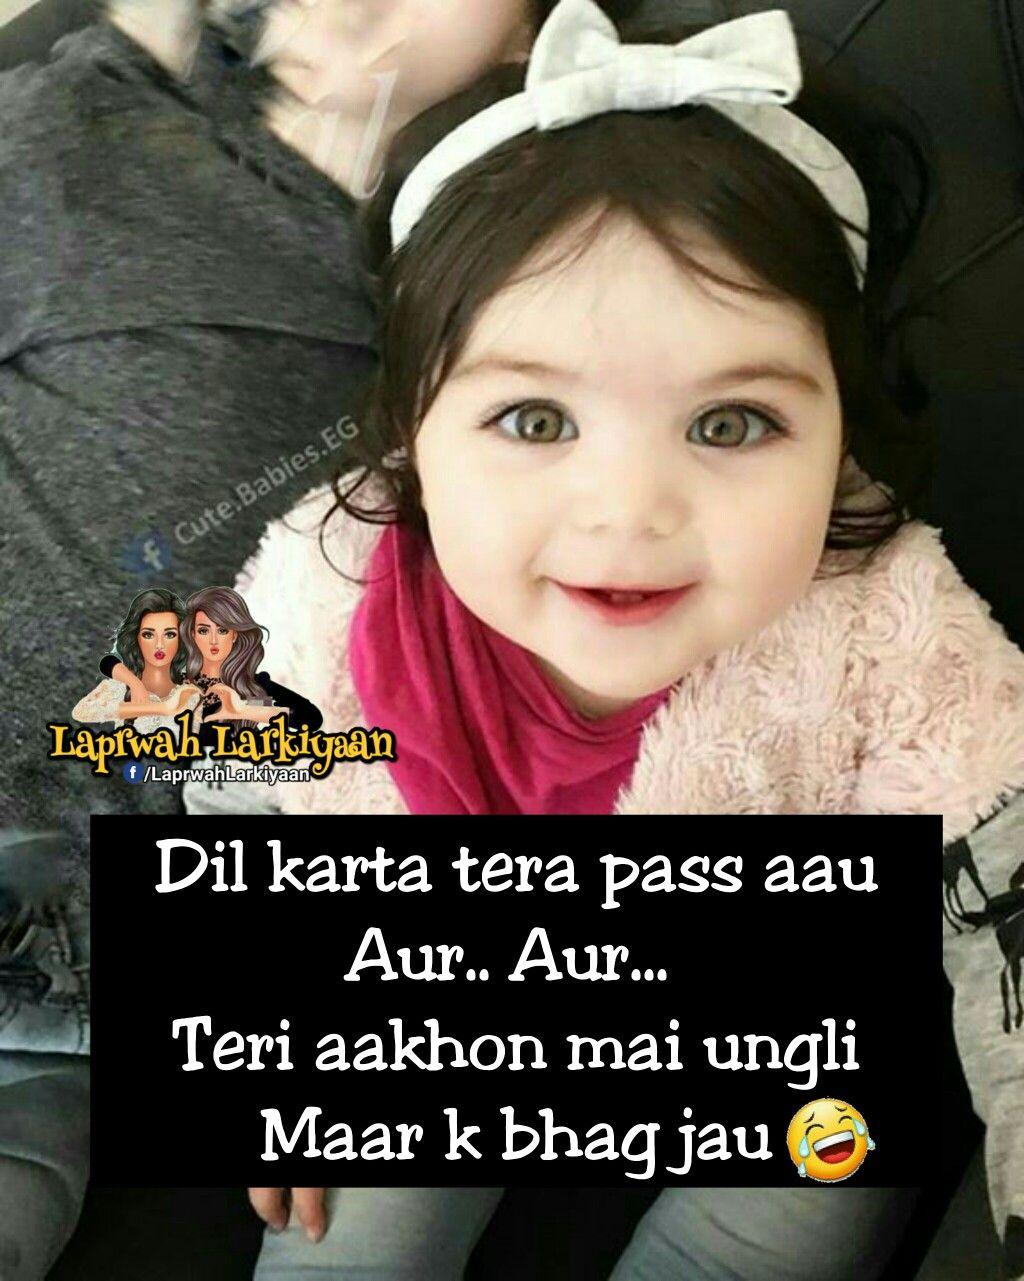 Pin by PARDEEP on Laprwah Larkiyaan | Cute baby quotes ...